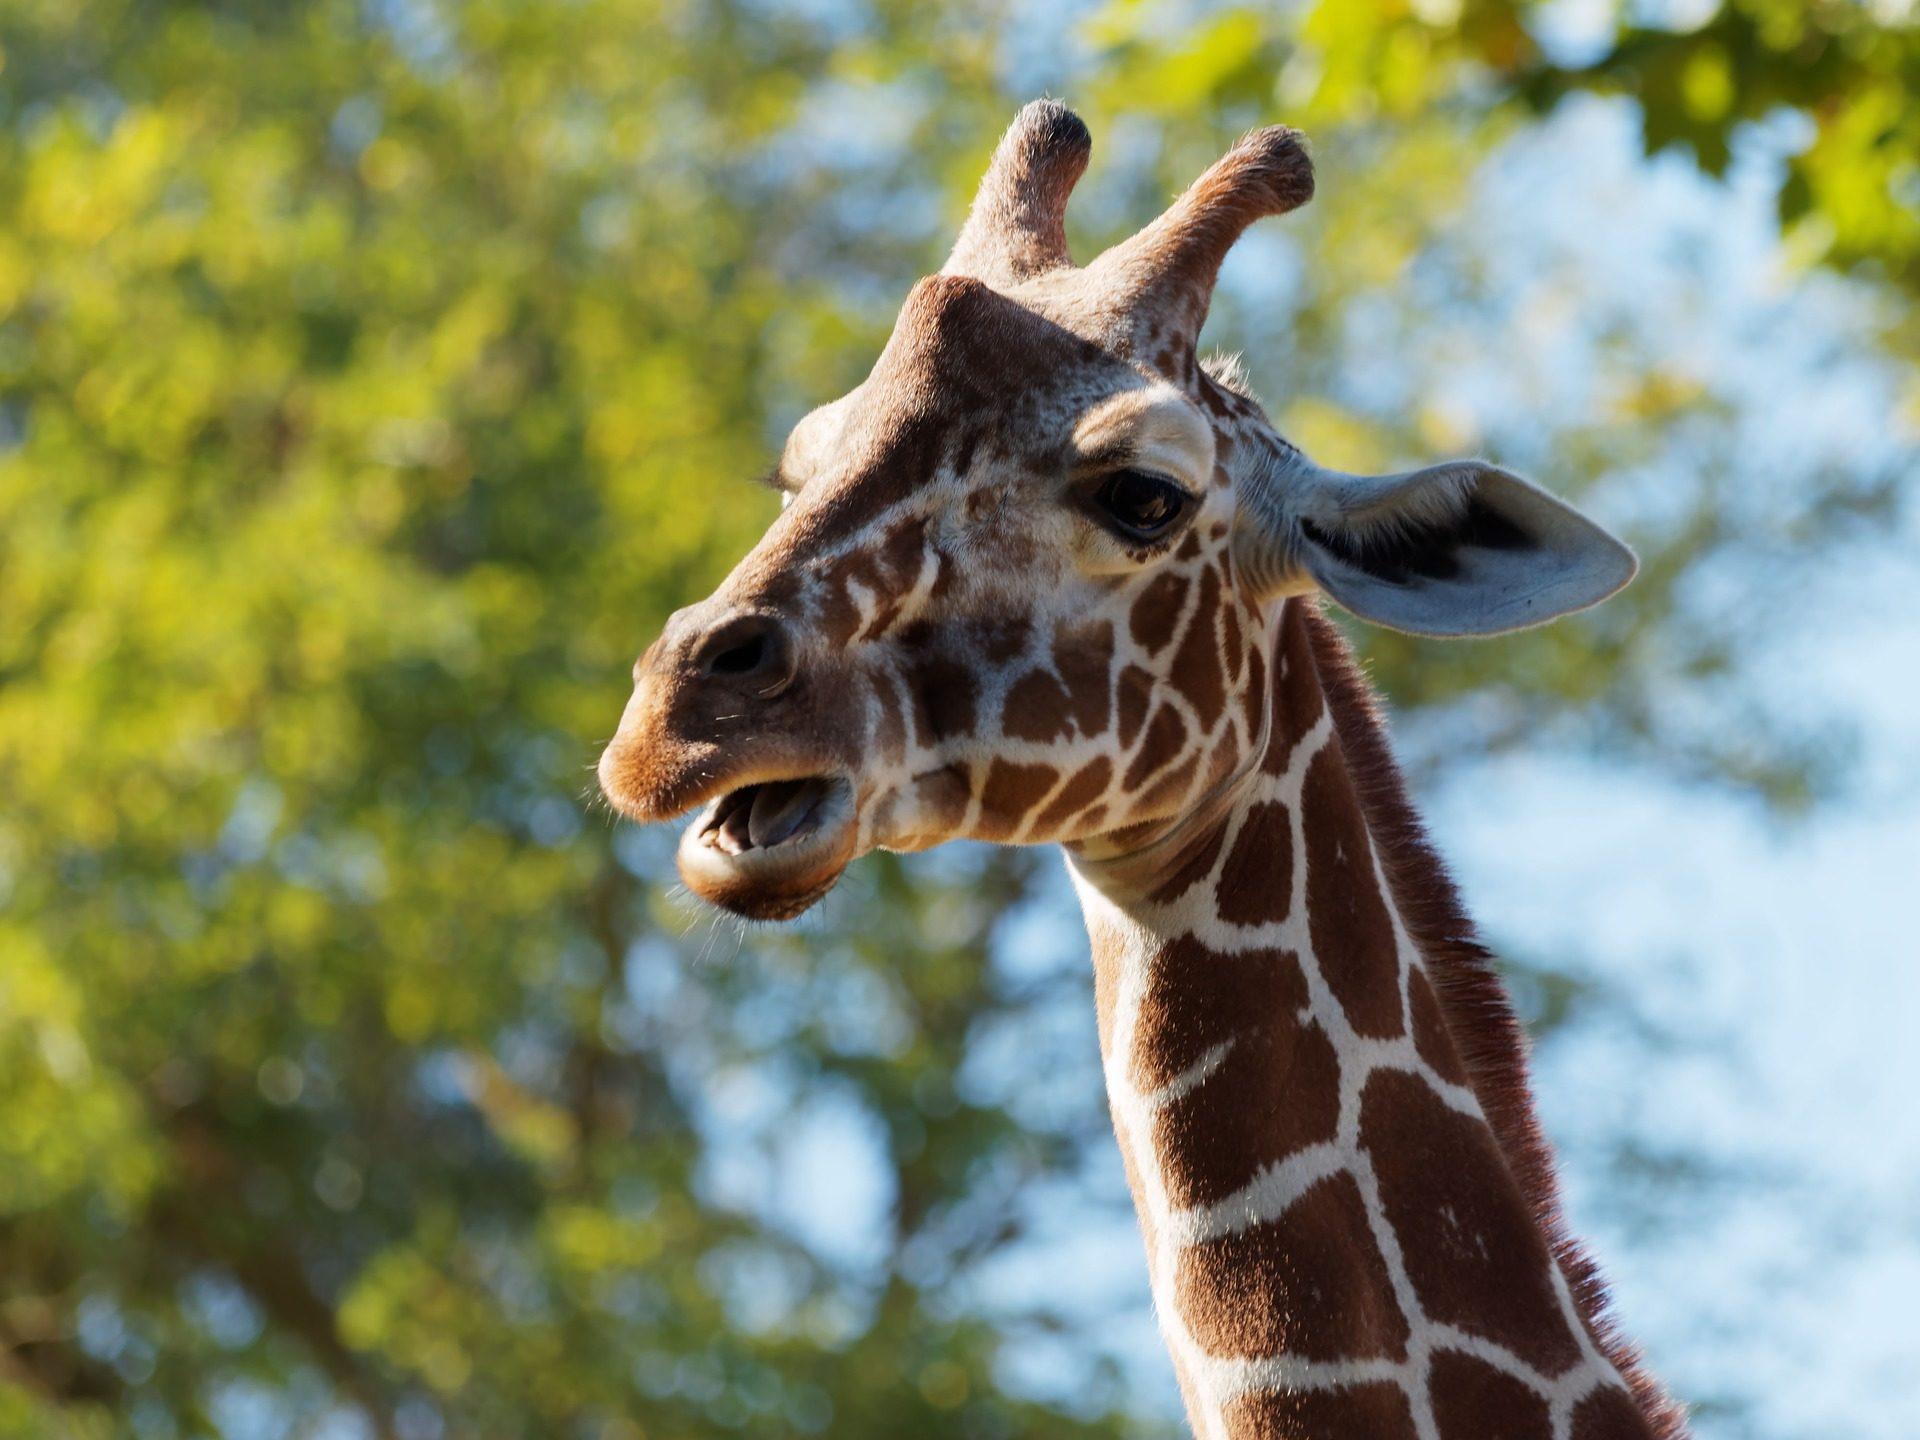 Girafa, Safari, Africa, mammifero, corni - Sfondi HD - Professor-falken.com